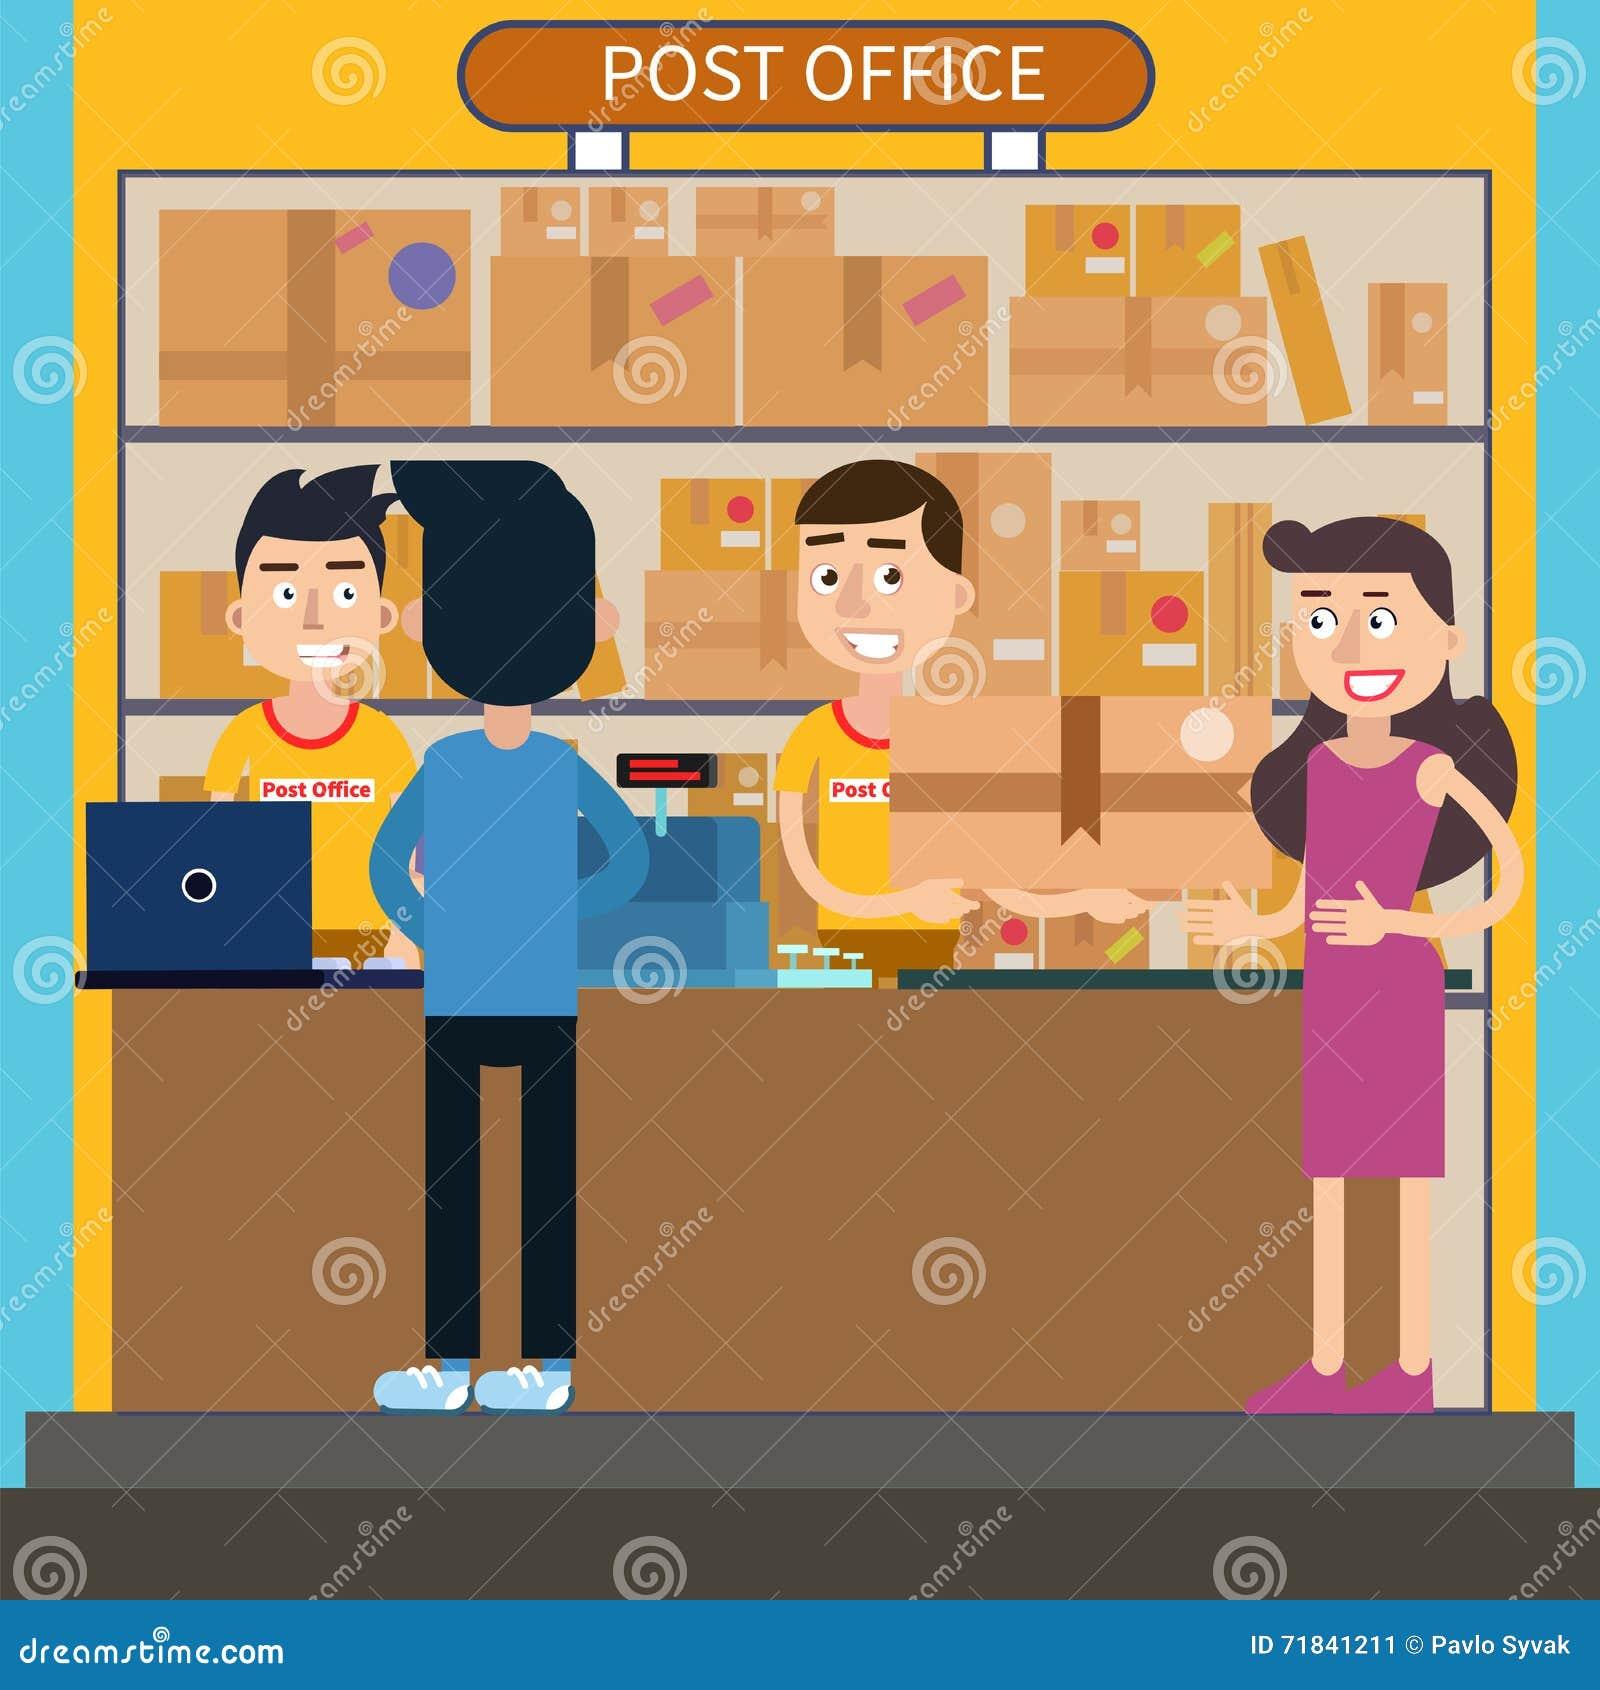 Post Service: Post Office. Woman Receiving Parcel. Postal Service